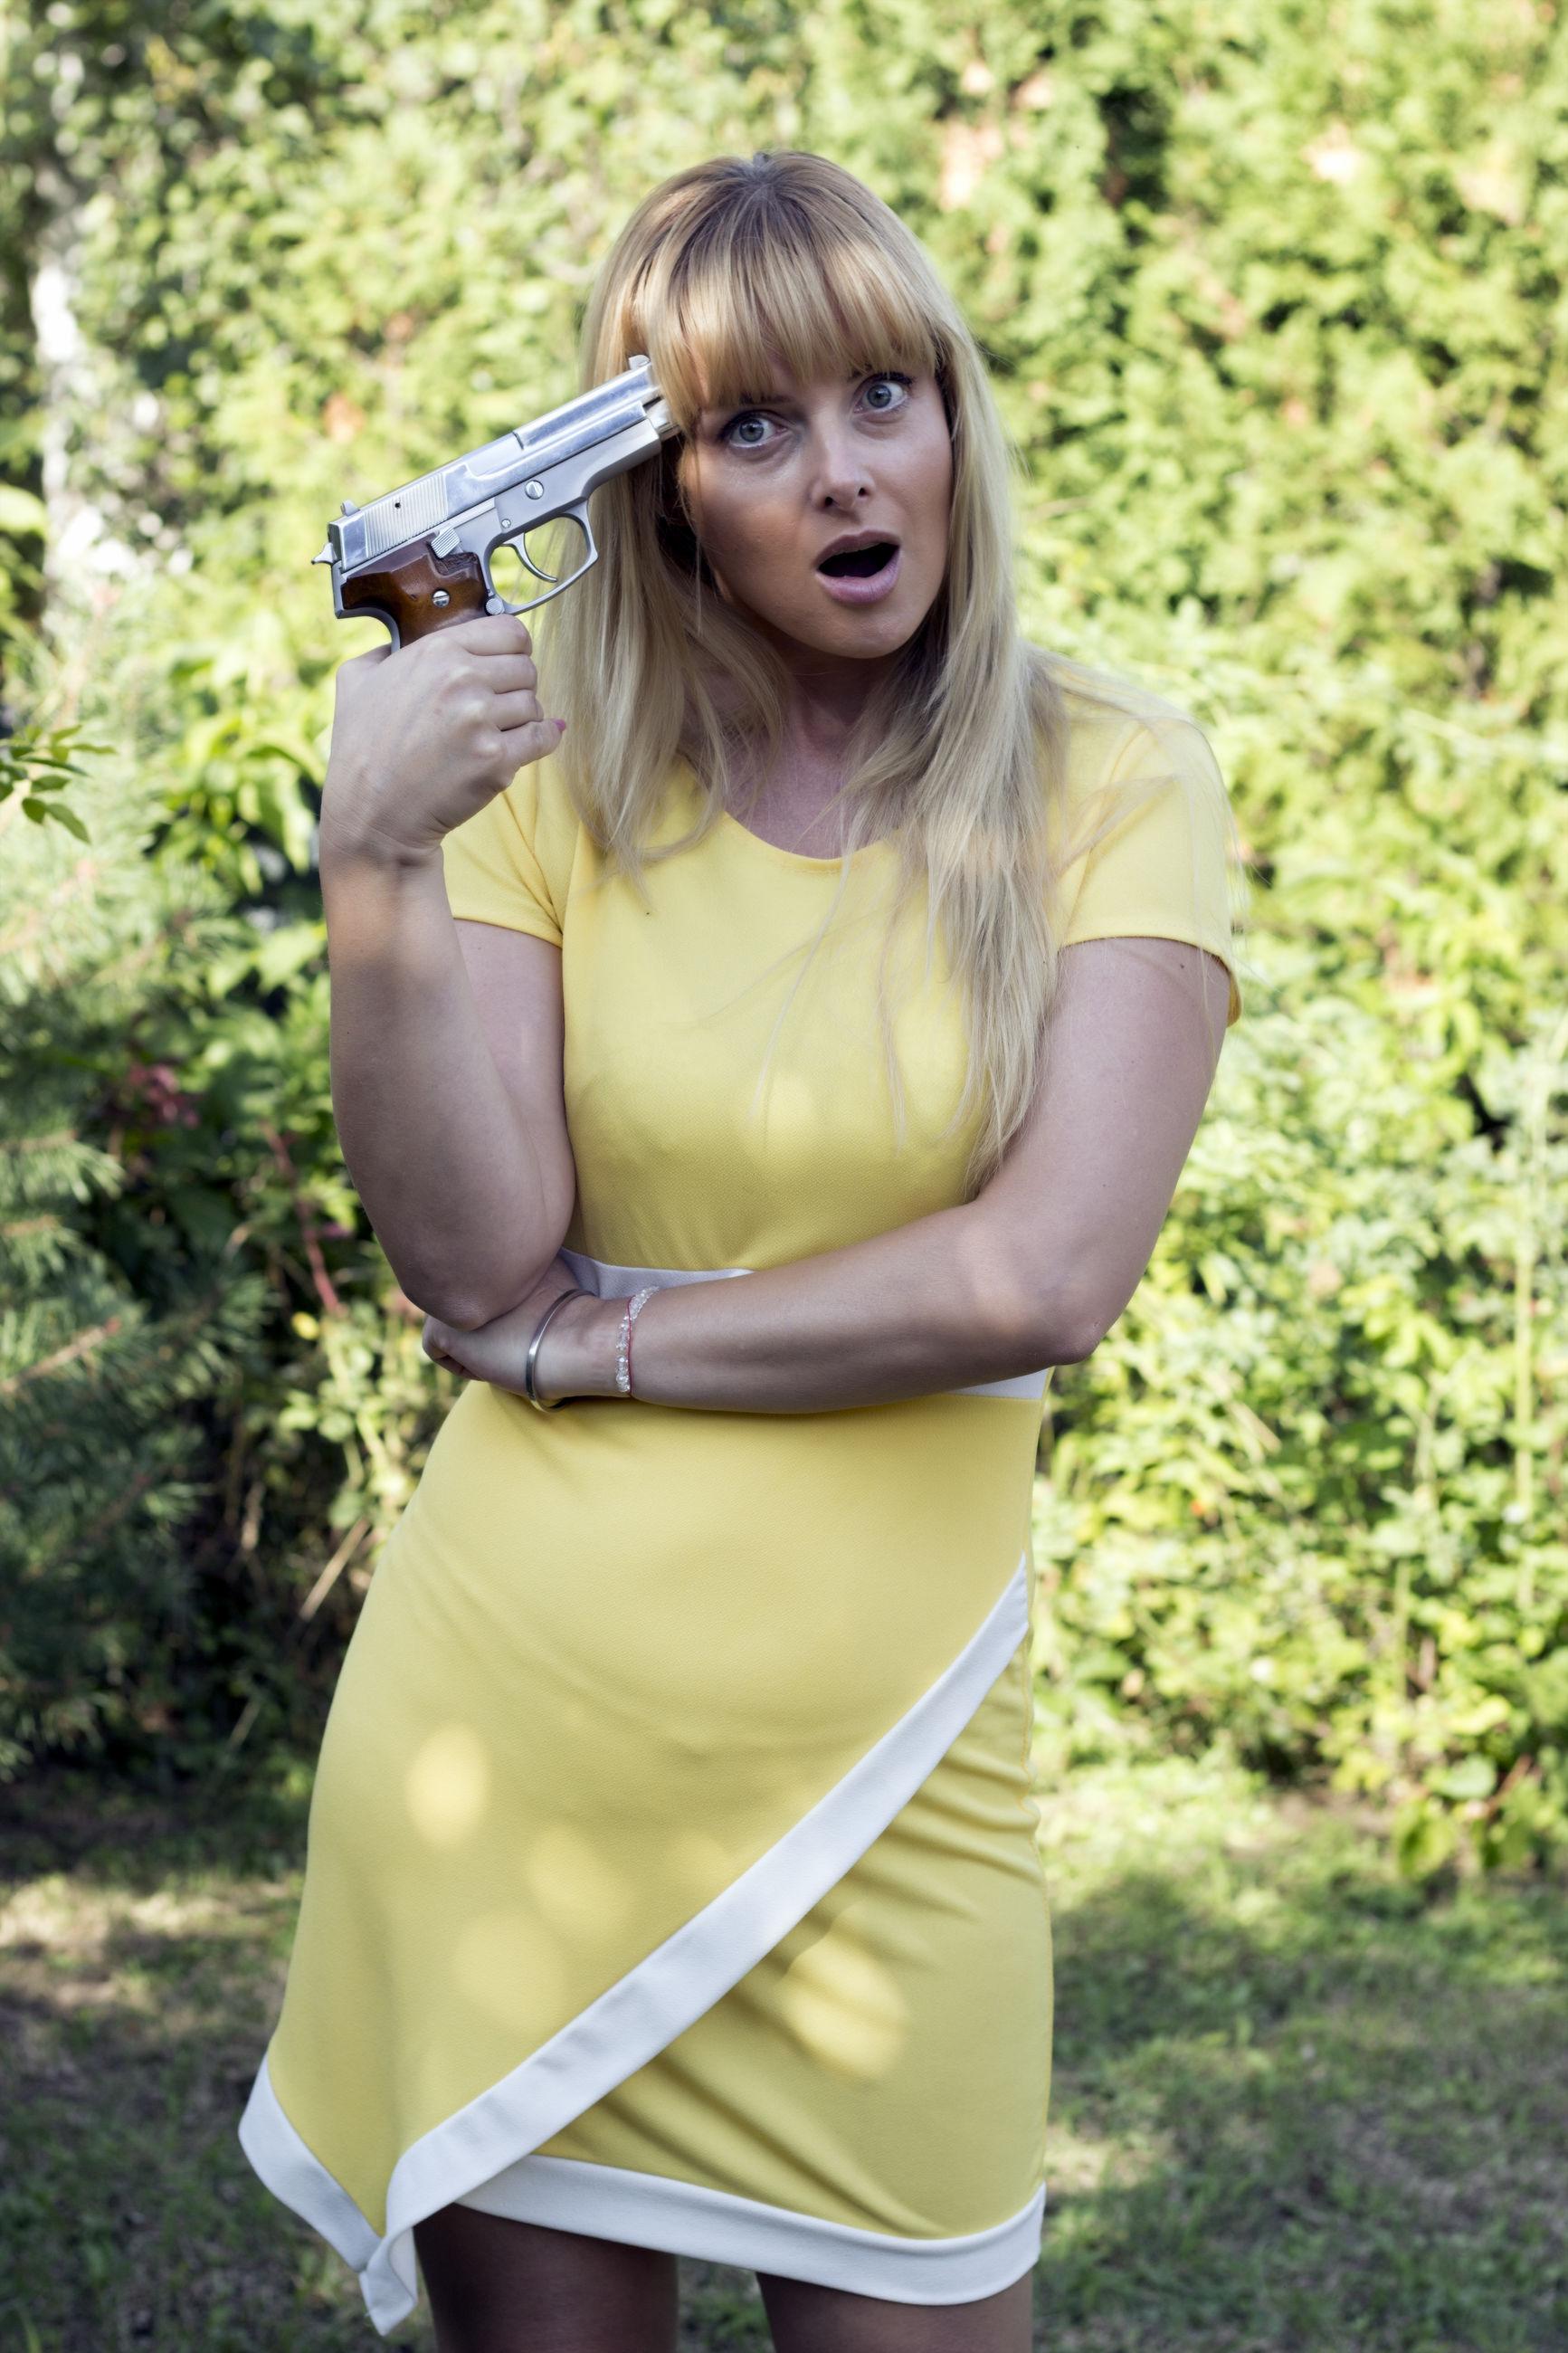 Portrait of woman shooting herself with handgun